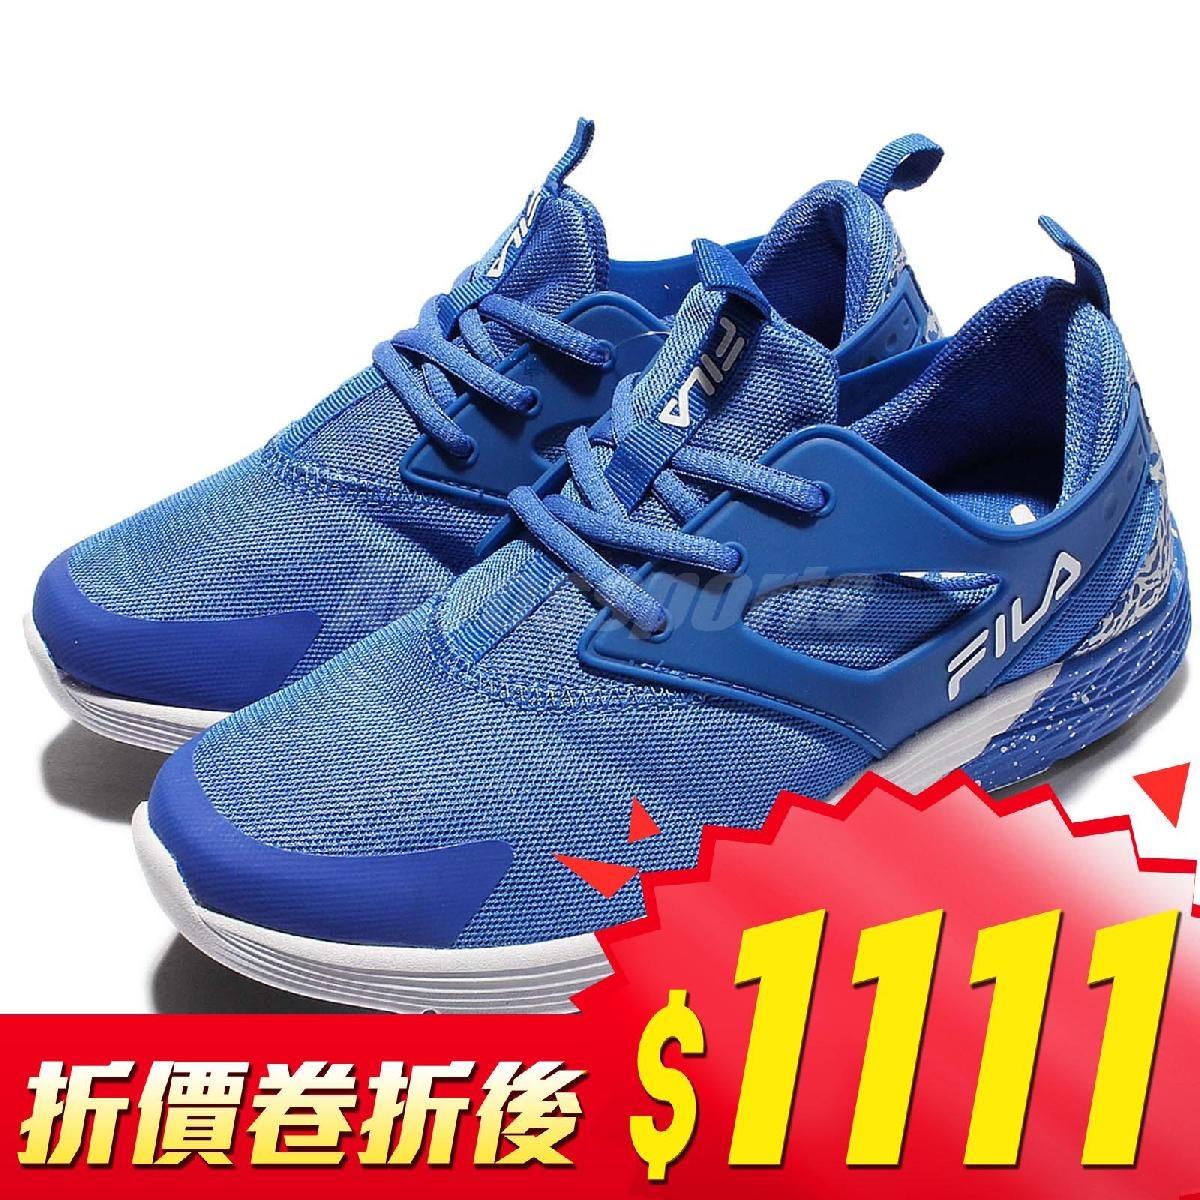 FILA 慢跑鞋 X309R 低筒 襪套式 藍 白 運動鞋 潑墨 基本款 男鞋【PUMP306】 1X309R331